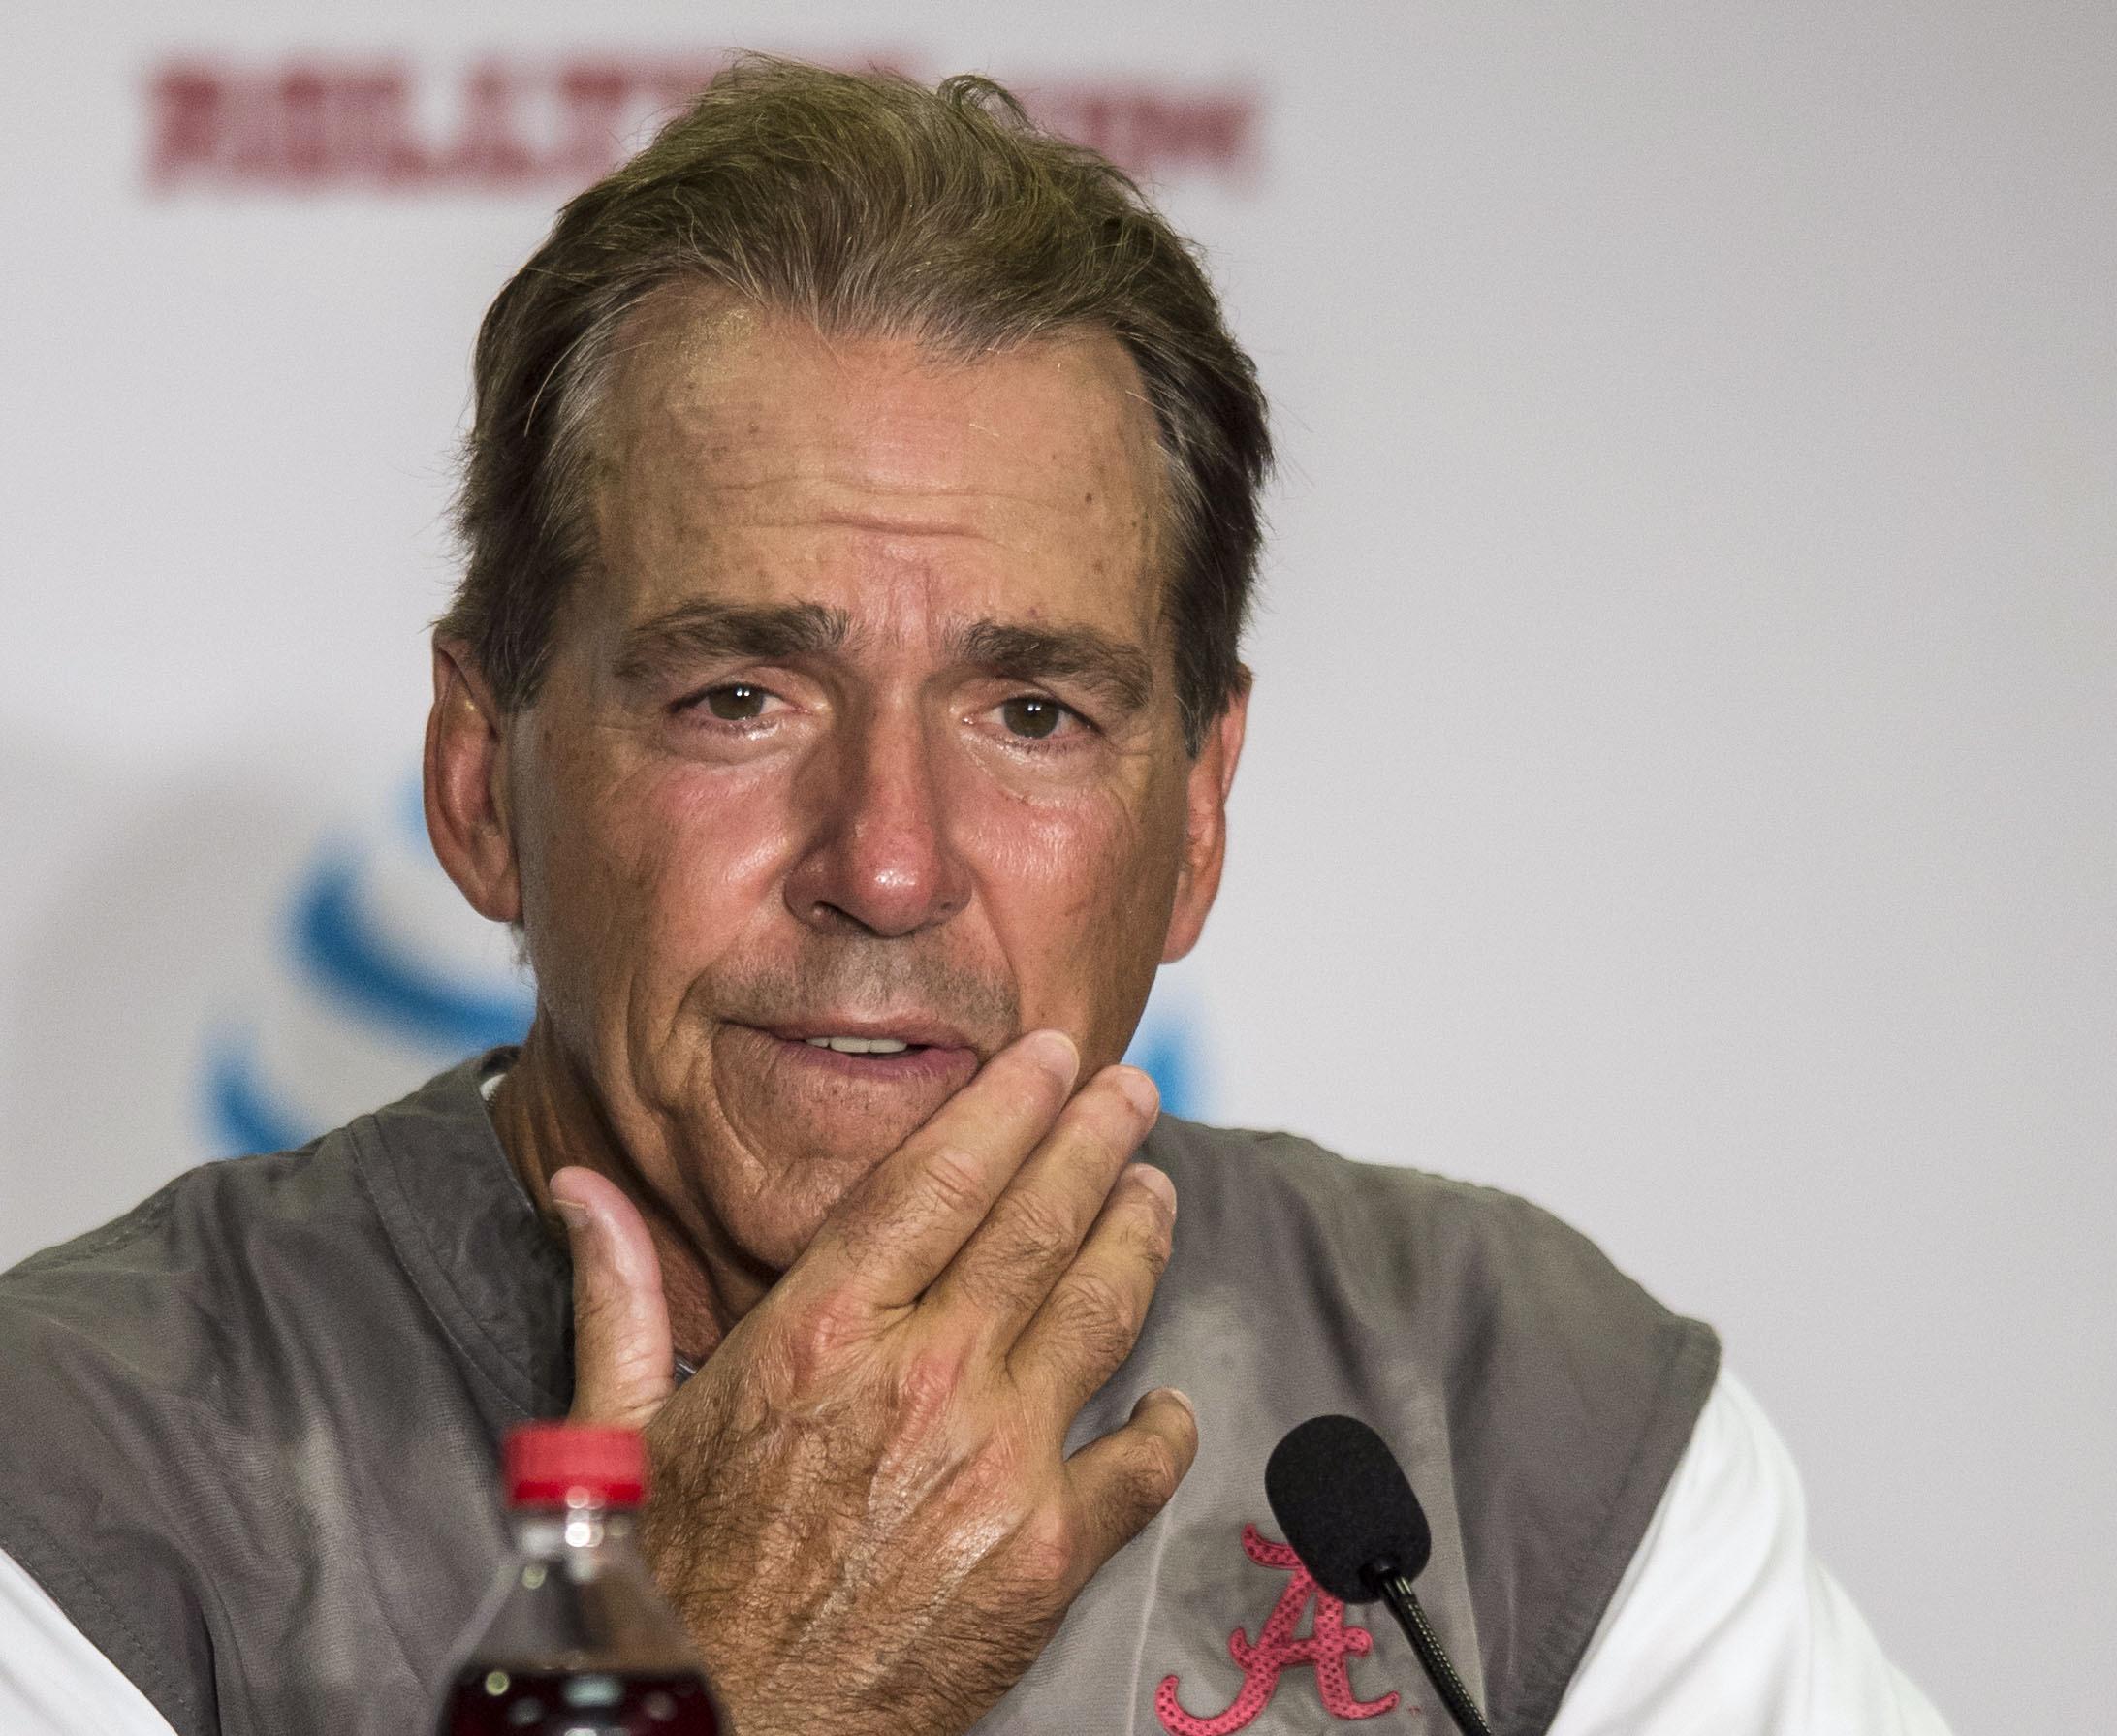 Alabama coach Nick Saban talks with reporters after the NCAA college football team's scrimmage  Saturday, Aug. 20, 2016, in Tuscaloosa, Ala. (Vasha Hunt/AL.com via AP)